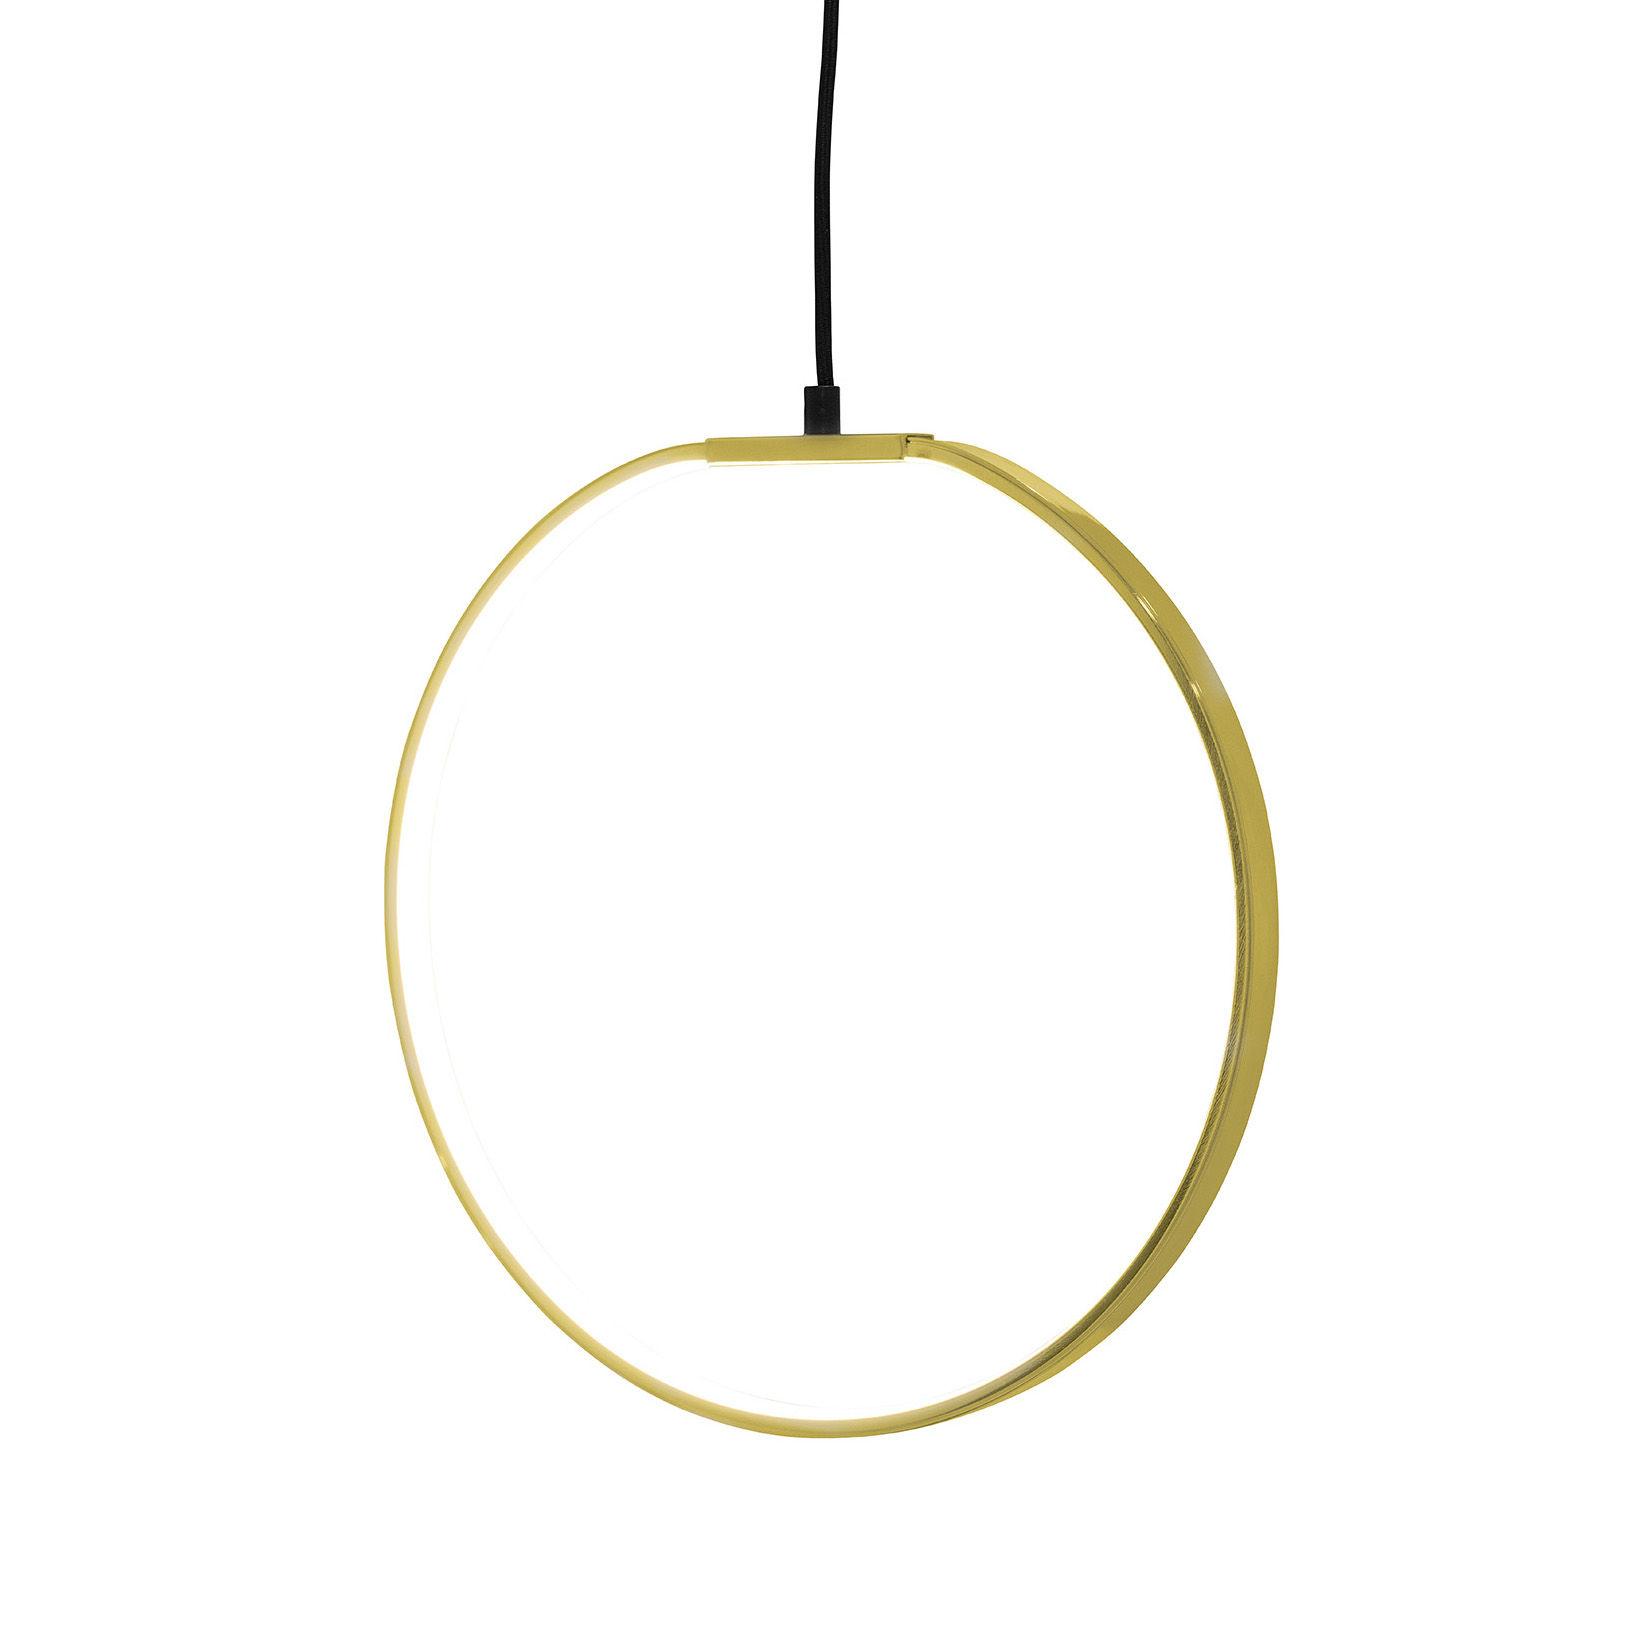 Illuminazione - Lampadari - Sospensione - LED / Ø 35 cm - Metallo di Bloomingville - Or - Métal finition dorée